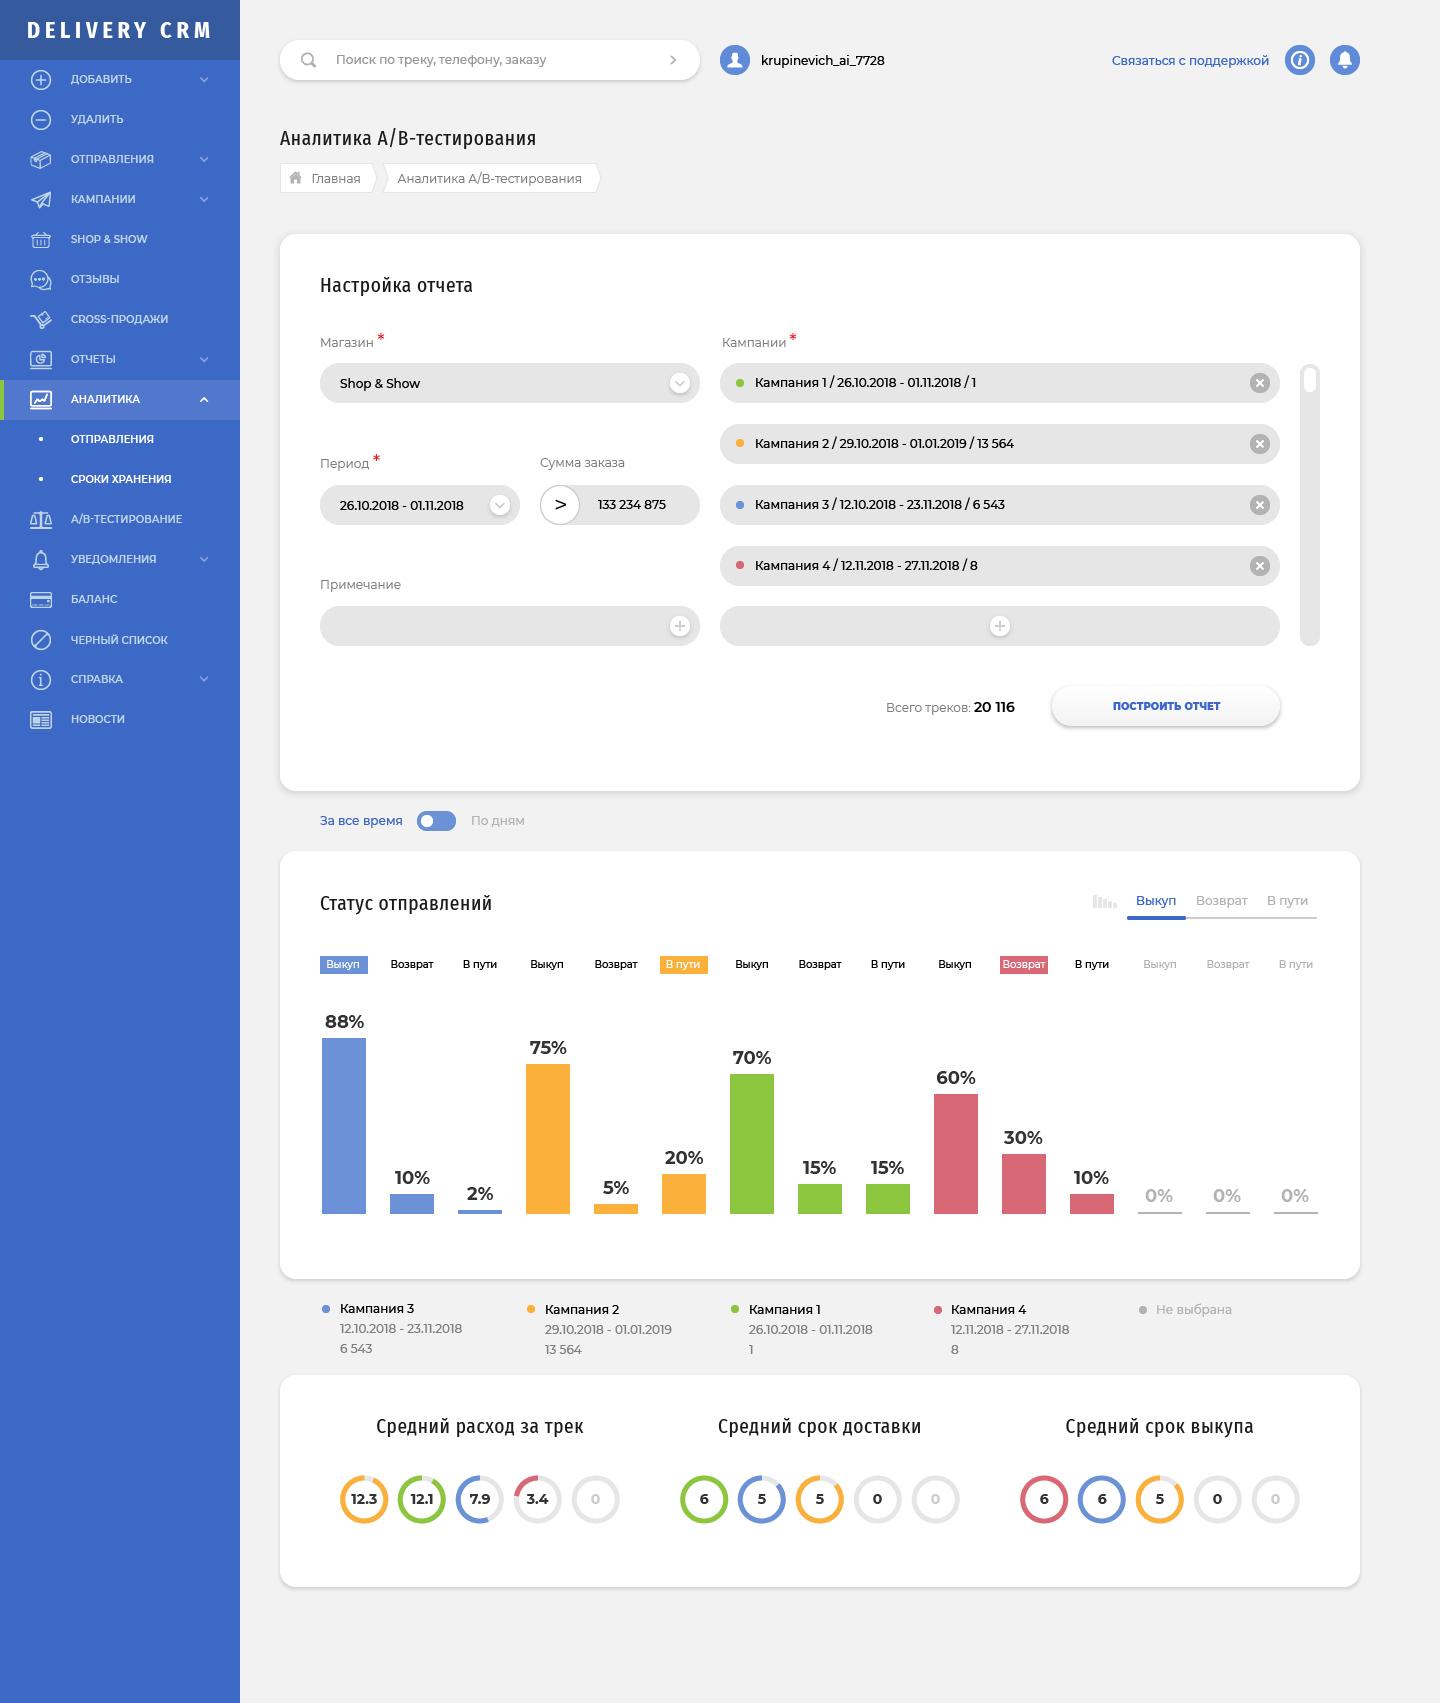 Дизайн страницы аналитики в ЛК Saas сервиса для e-com фото f_5555c0585fa01996.jpg